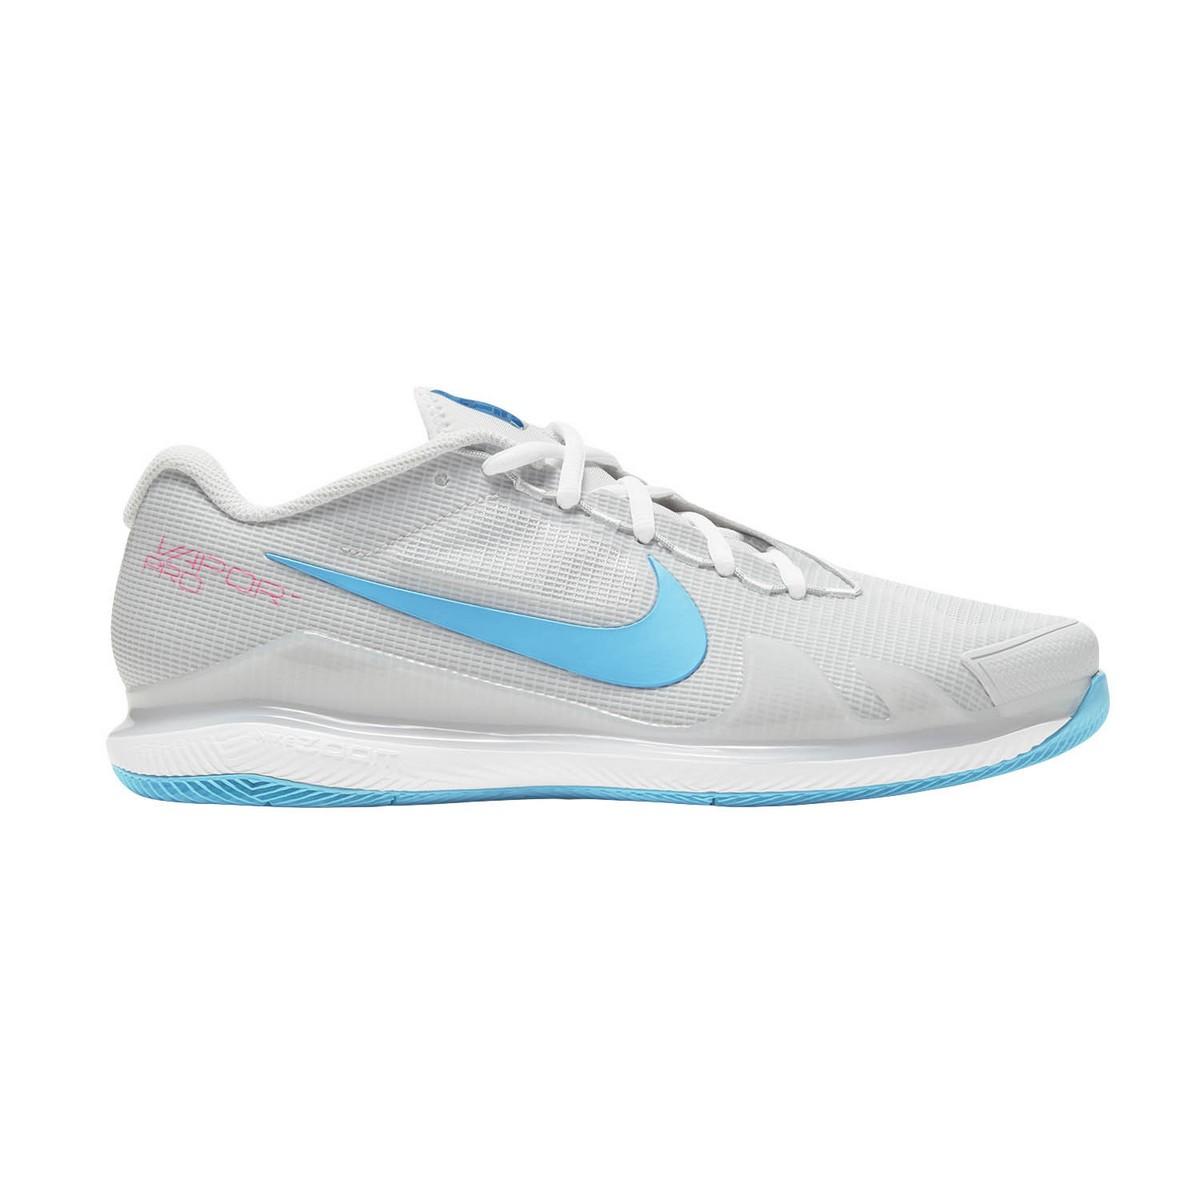 Tenisové boty Nike Zoom Vapor Pro HC CZ0220 Velikost: EU 39